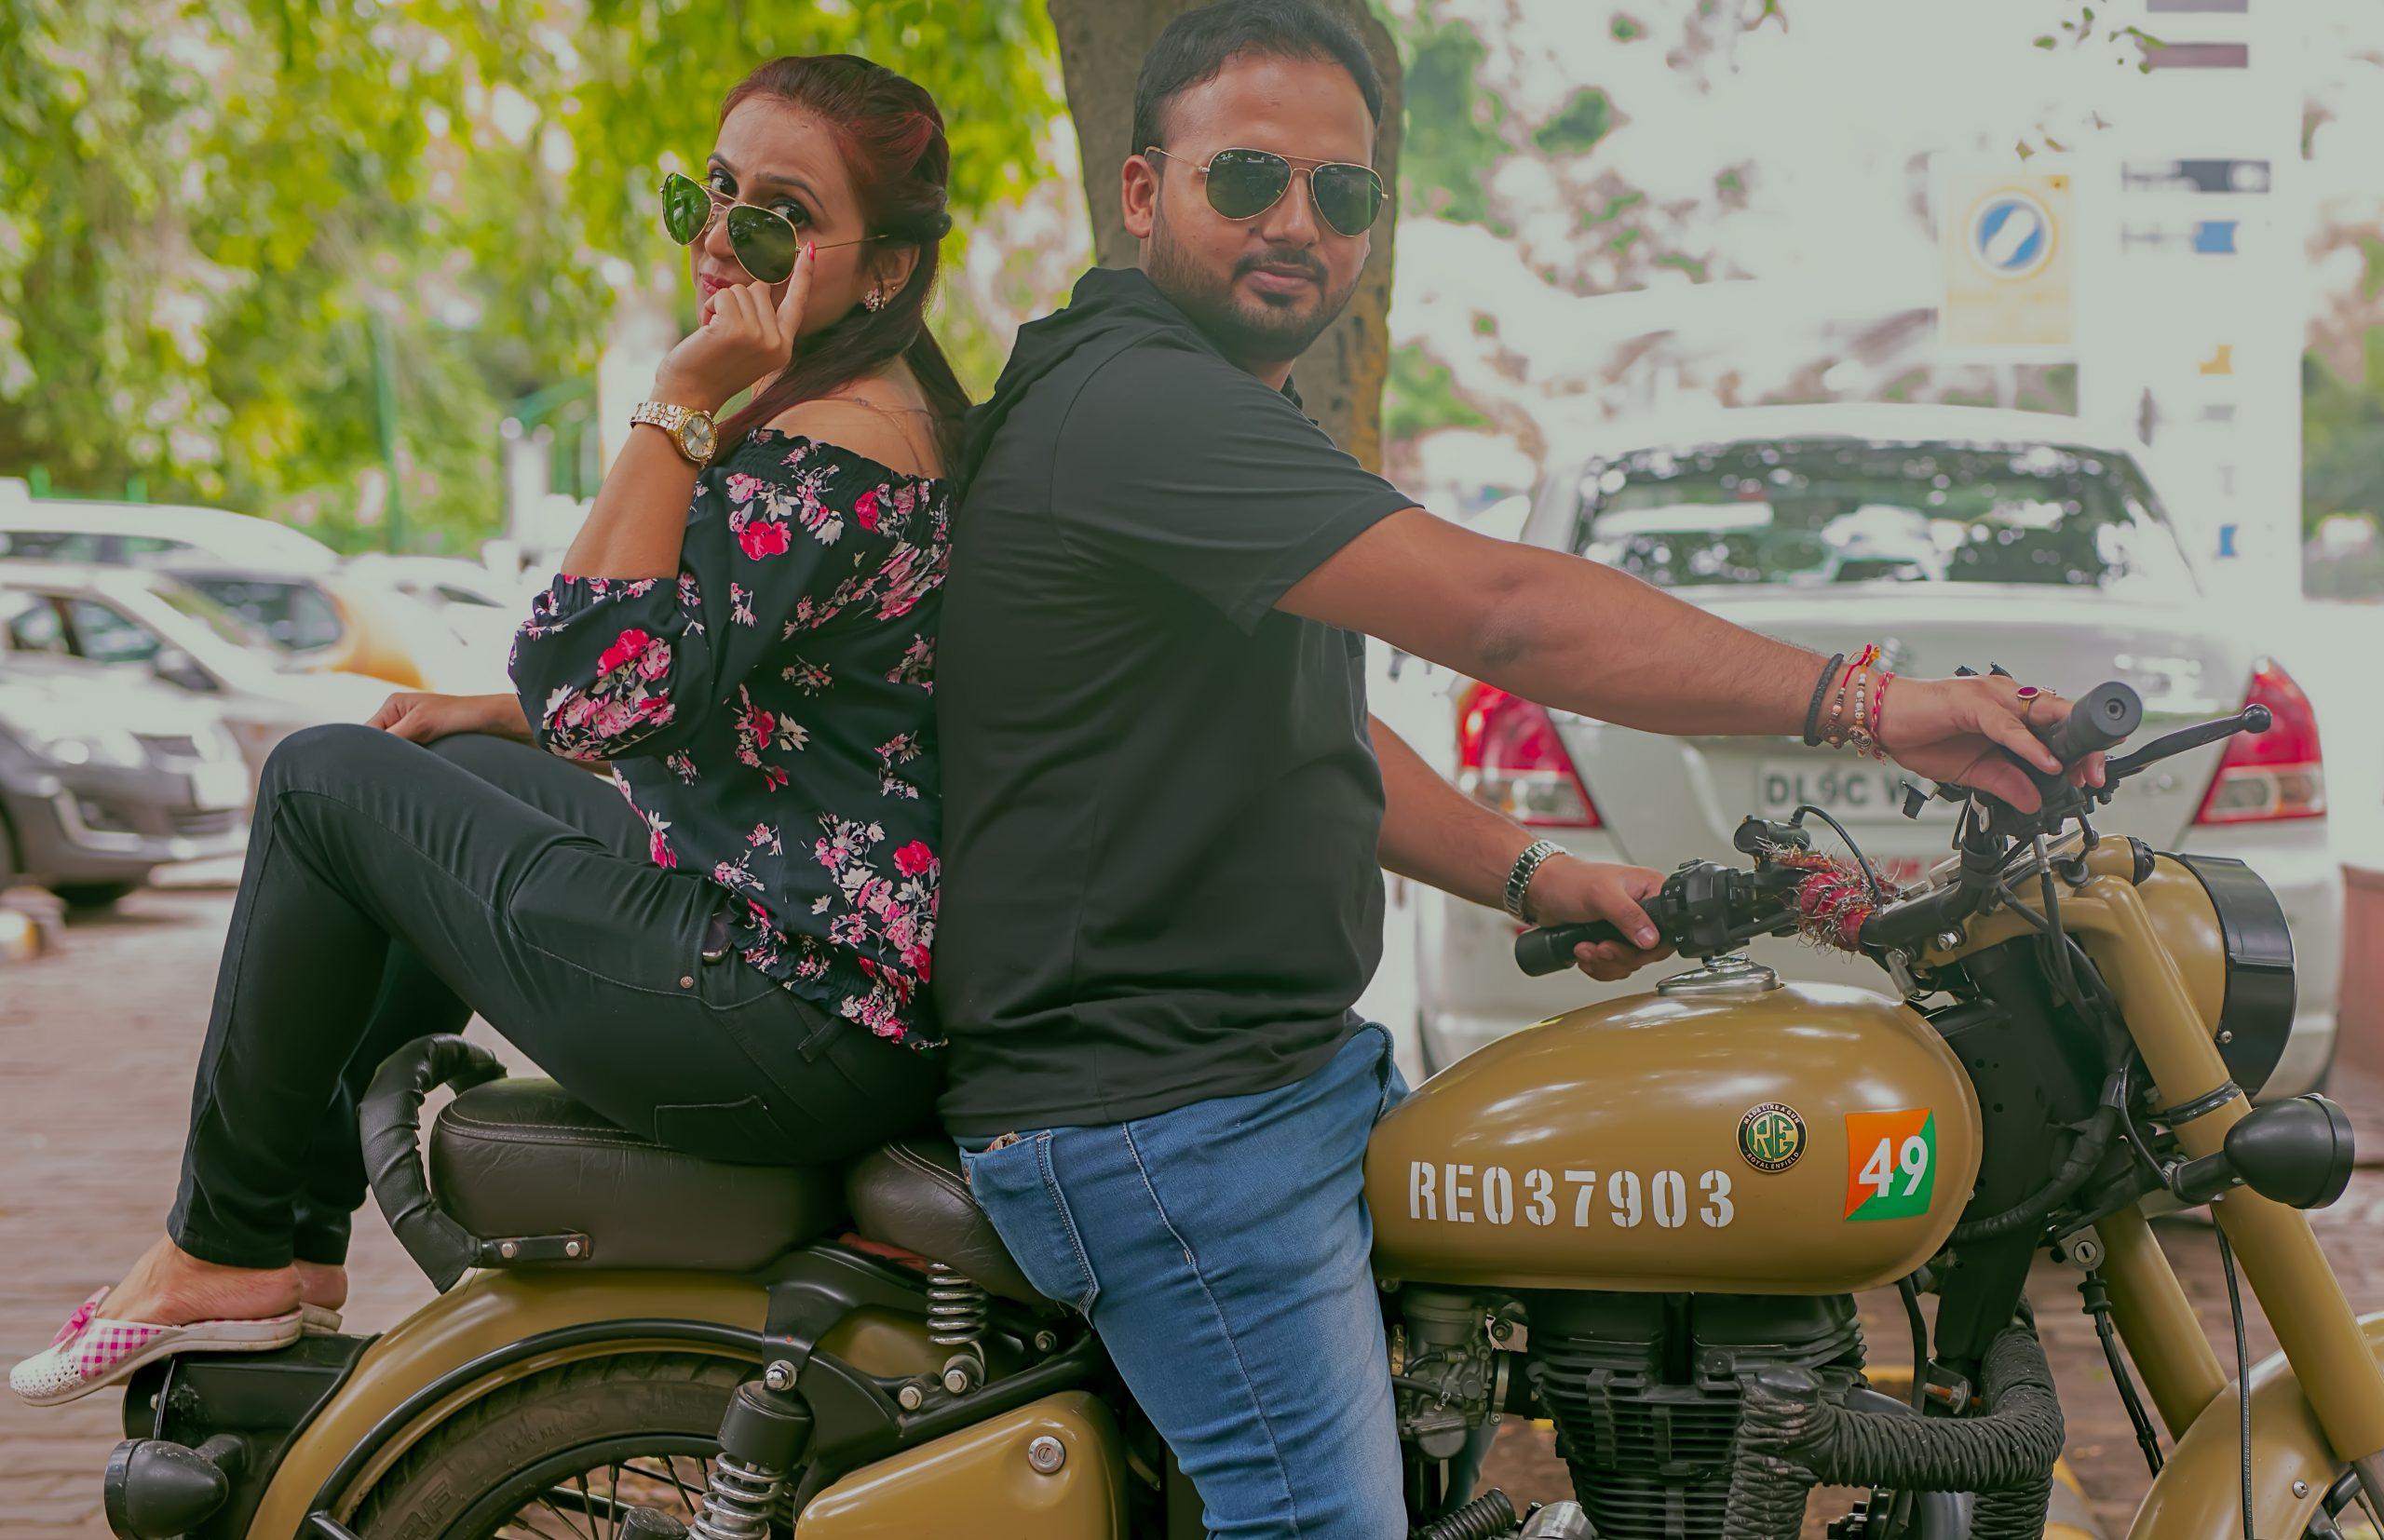 couple posing on motorbike